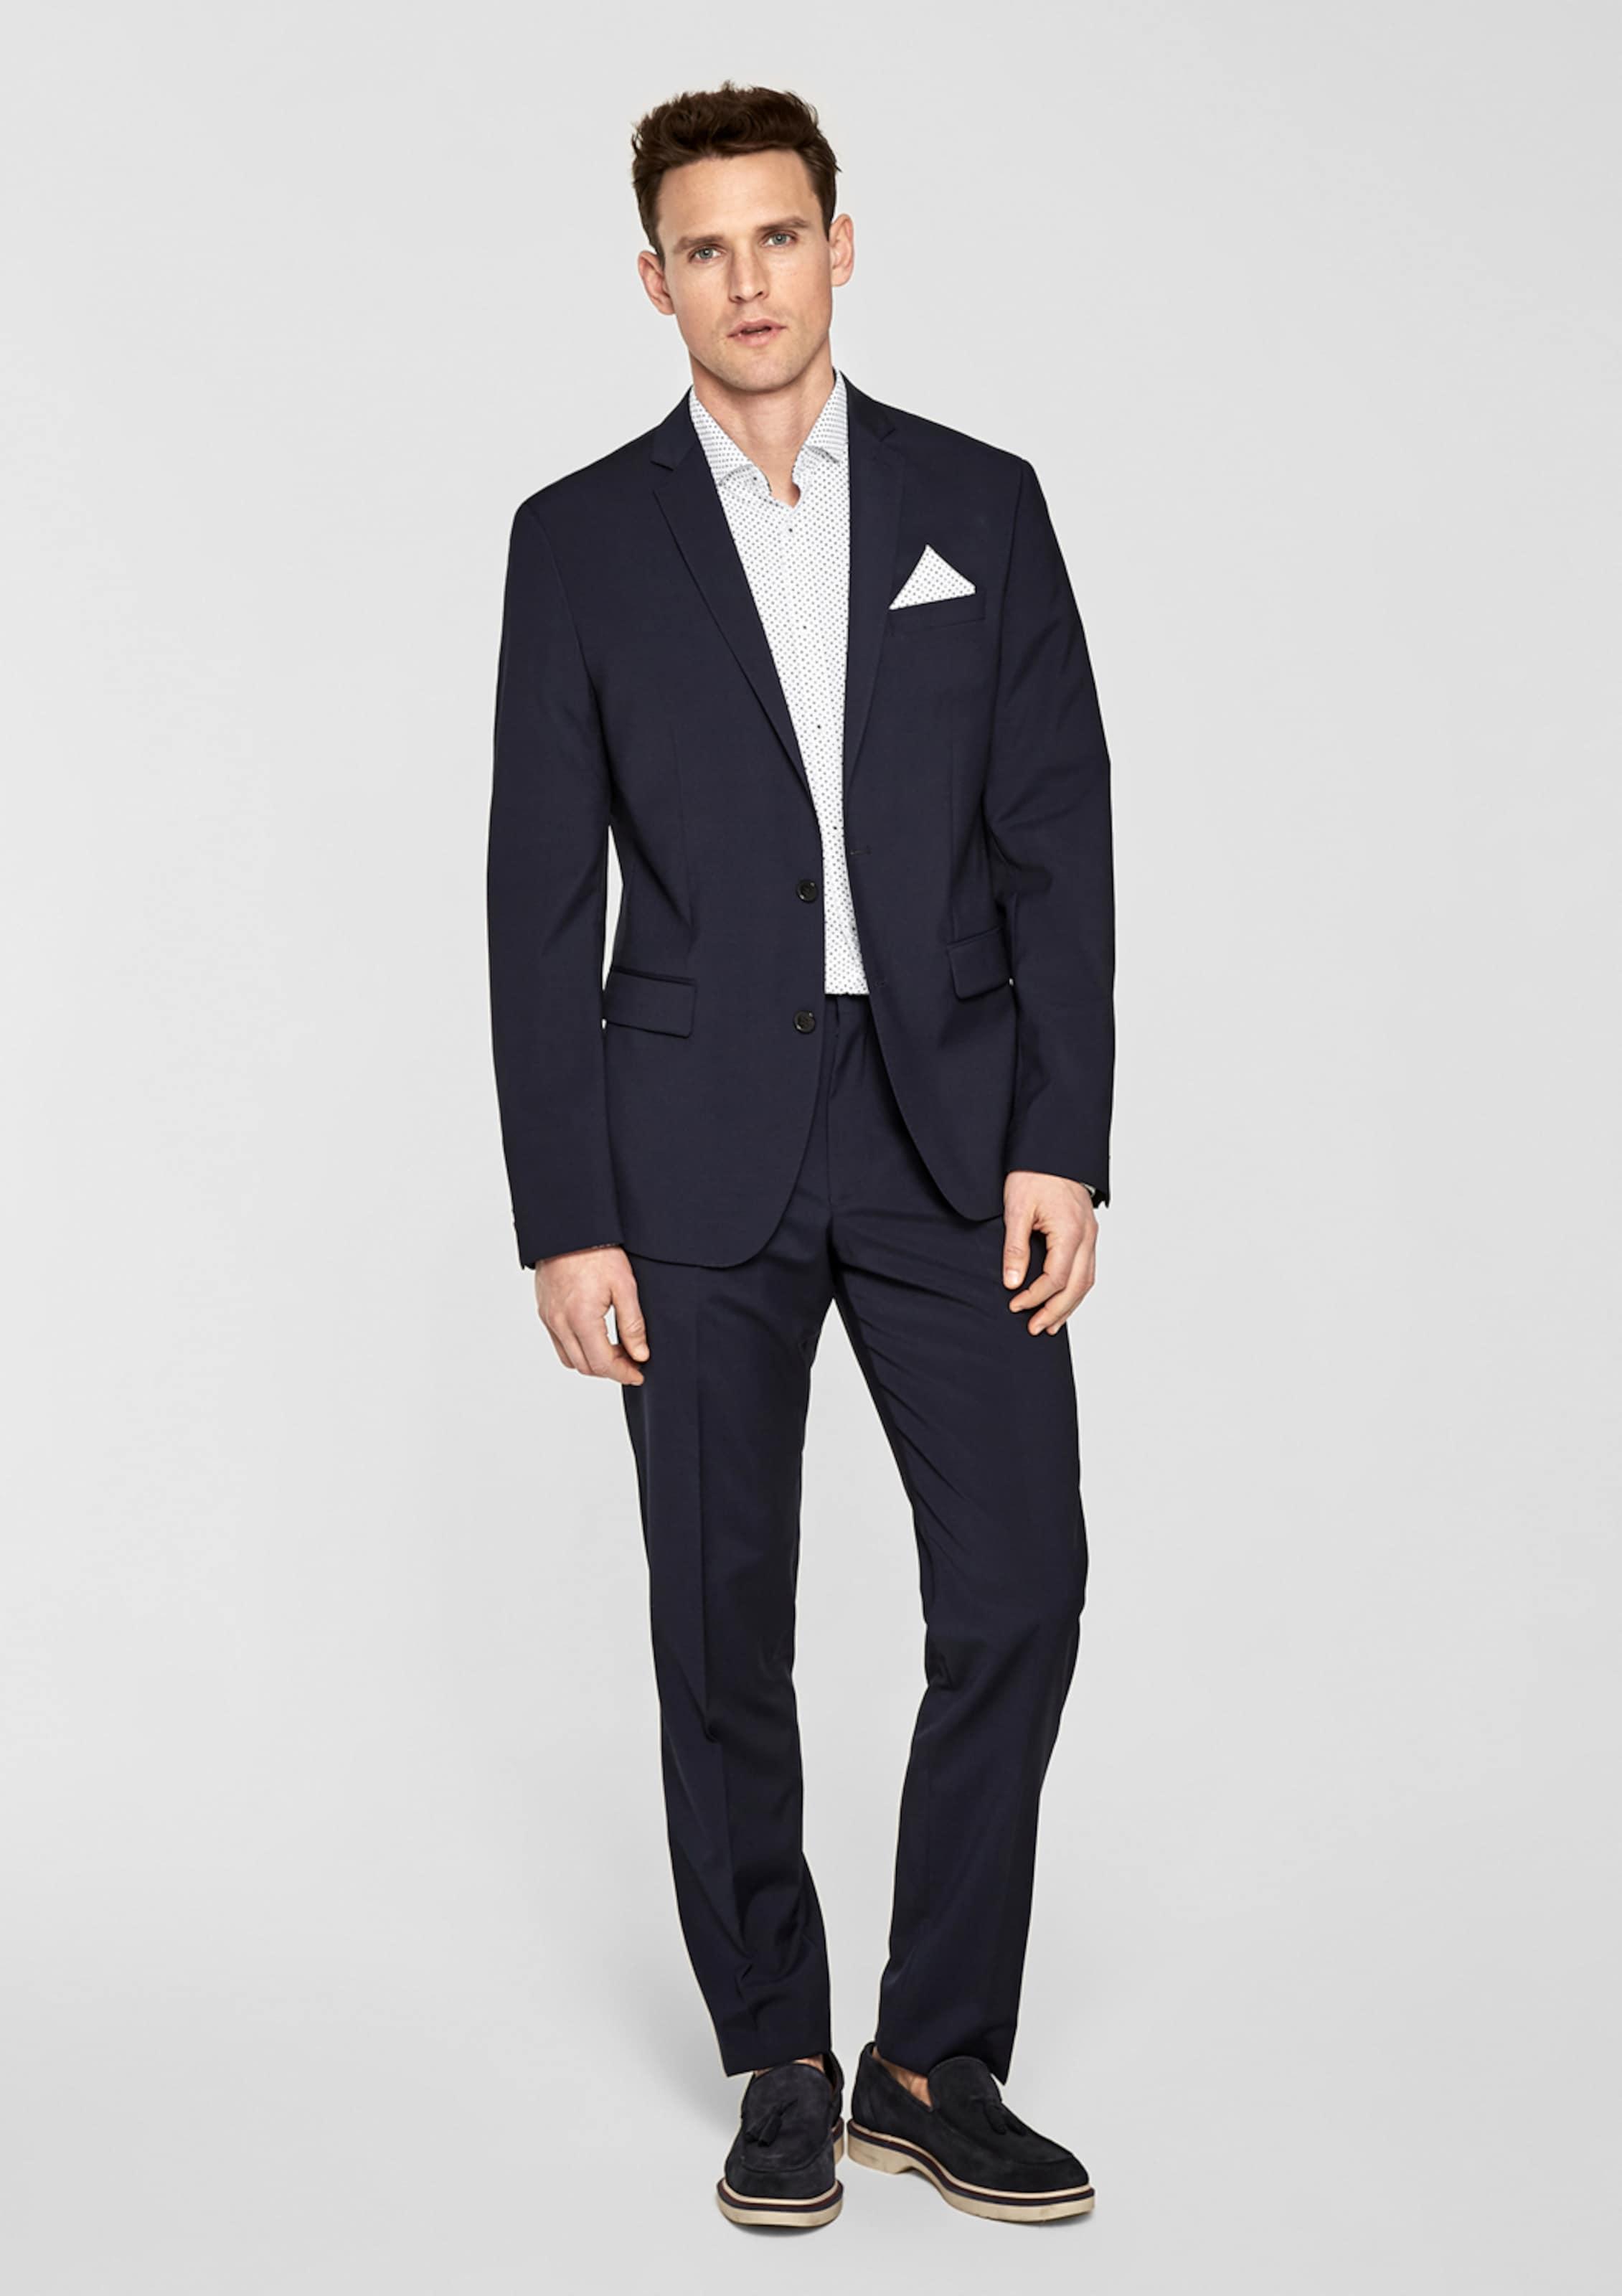 s.Oliver BLACK LABEL Modern Fit: Hemd mit Minimalmuster Billig Verkauf Besuch AaqrMRHTF